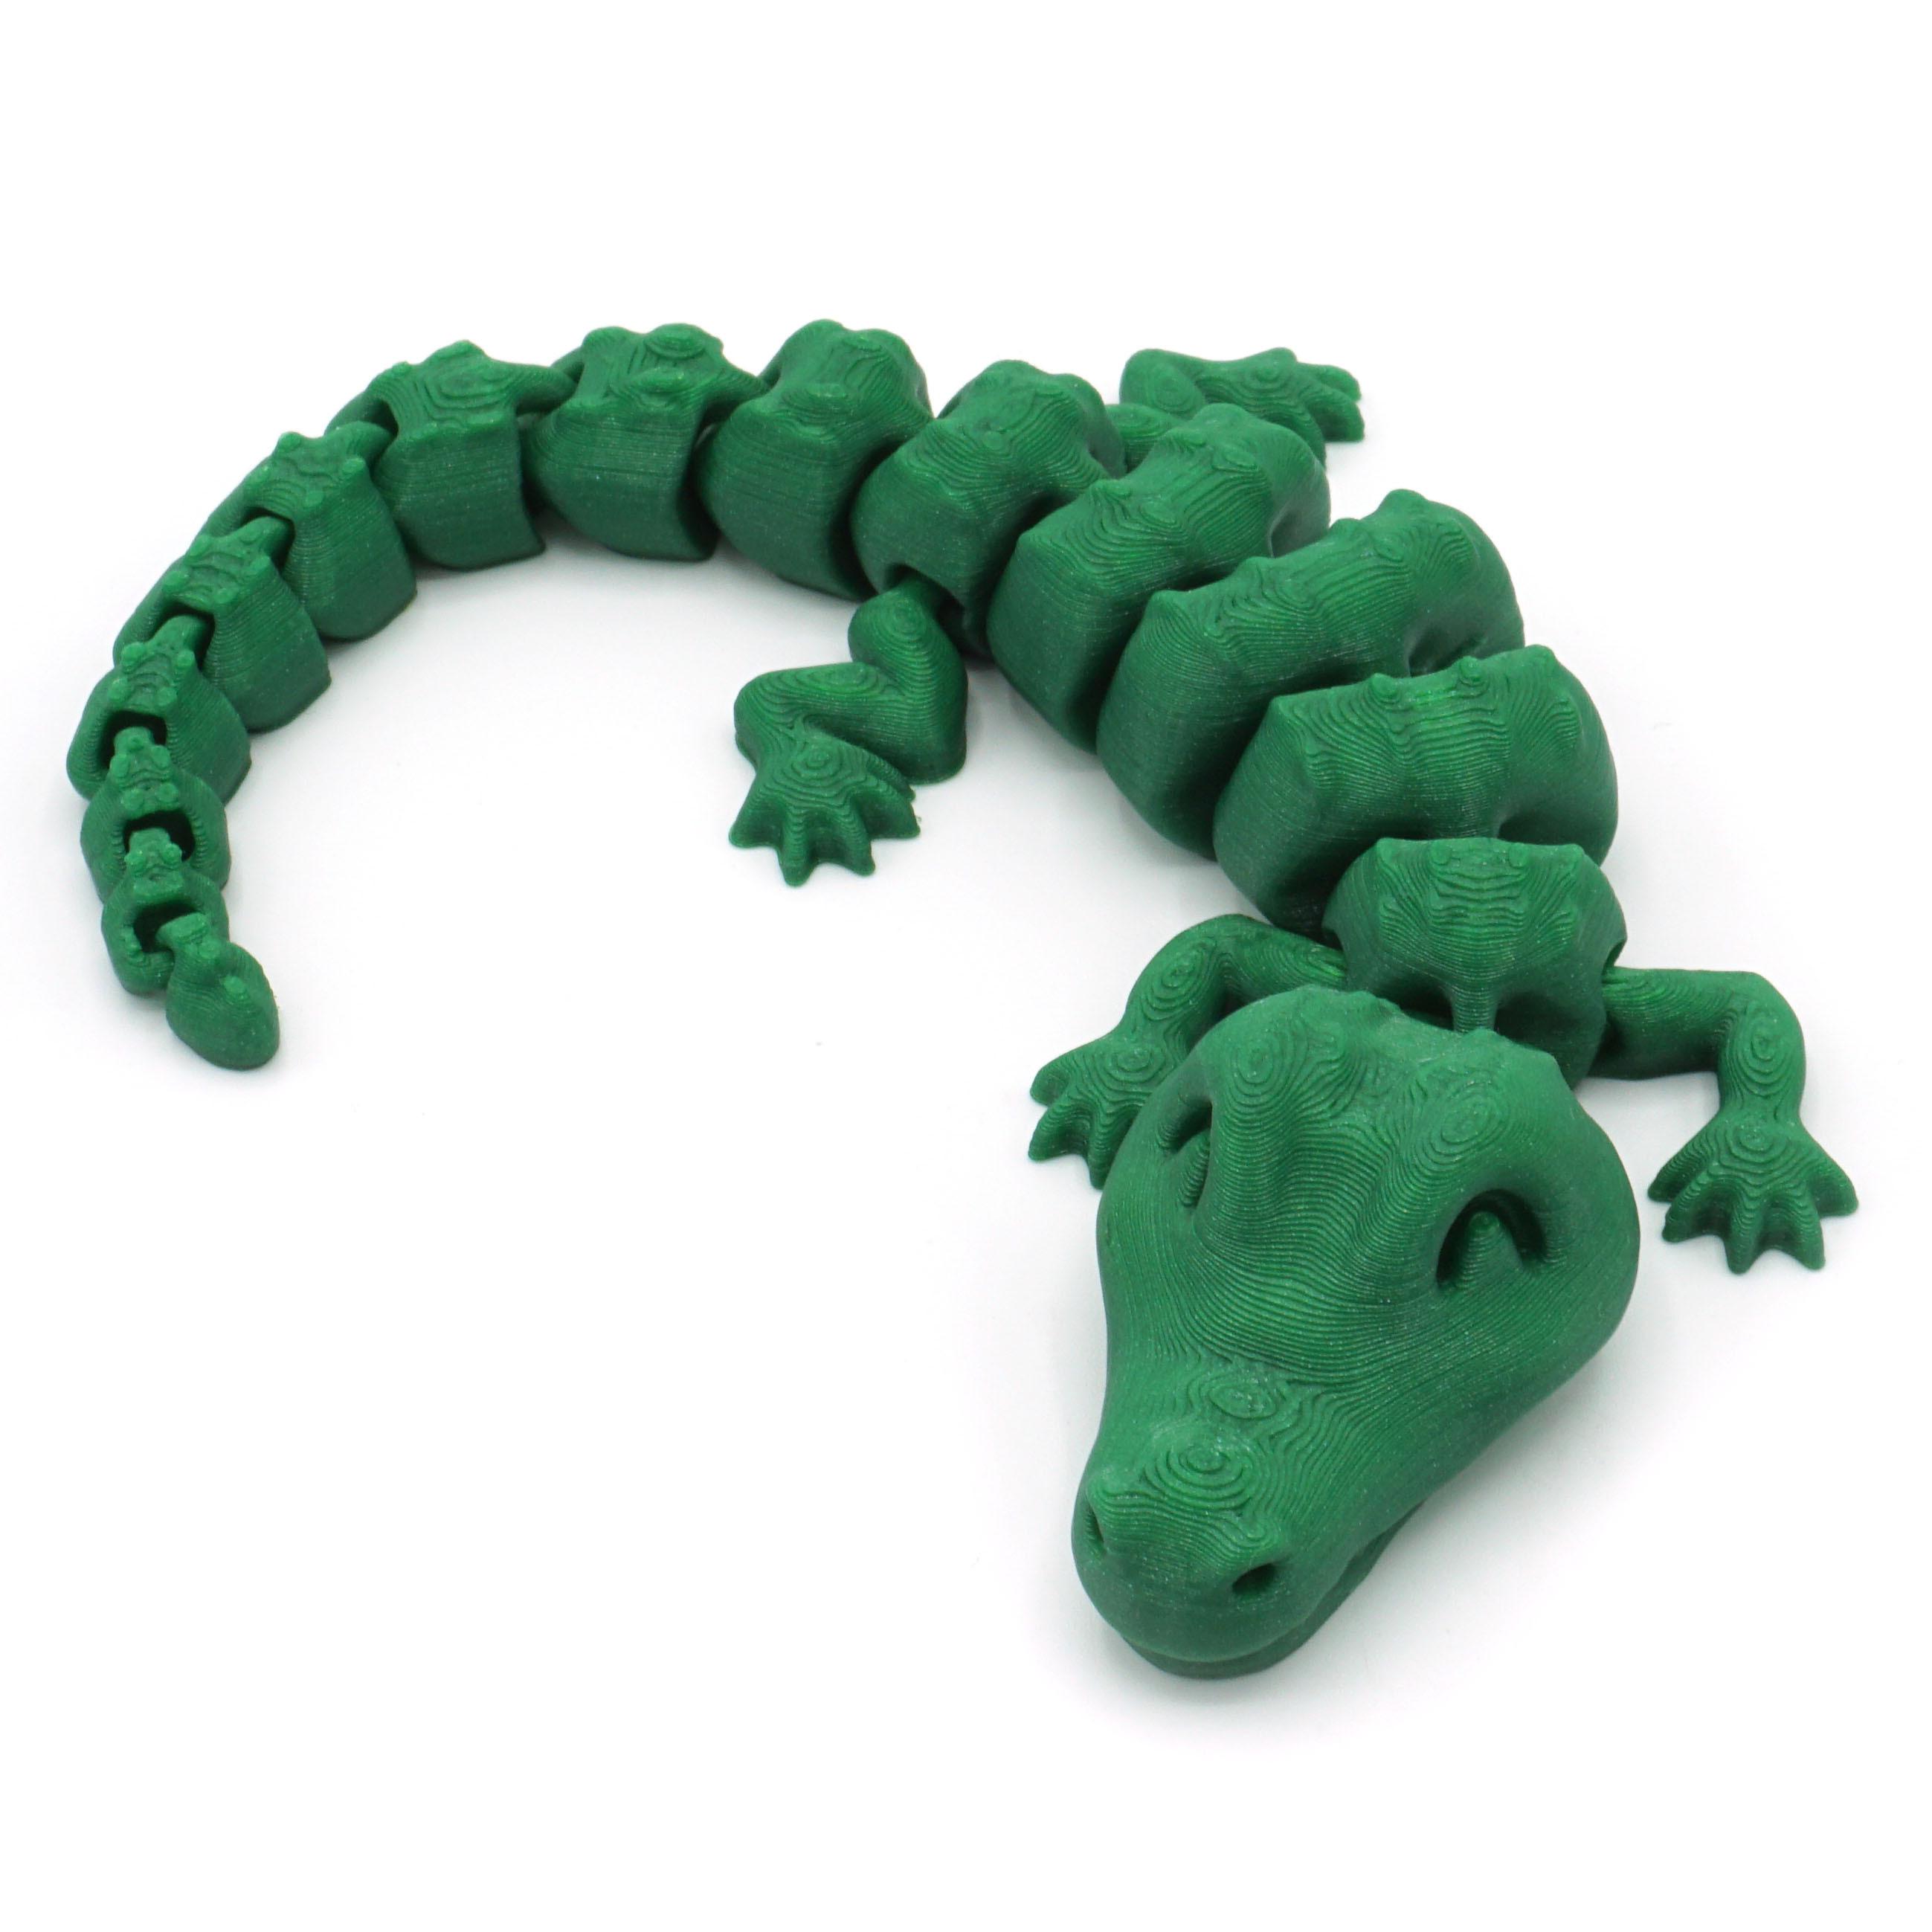 DSC01289 copia.jpg Download STL file Articulated Alligator • 3D printing object, mcgybeer